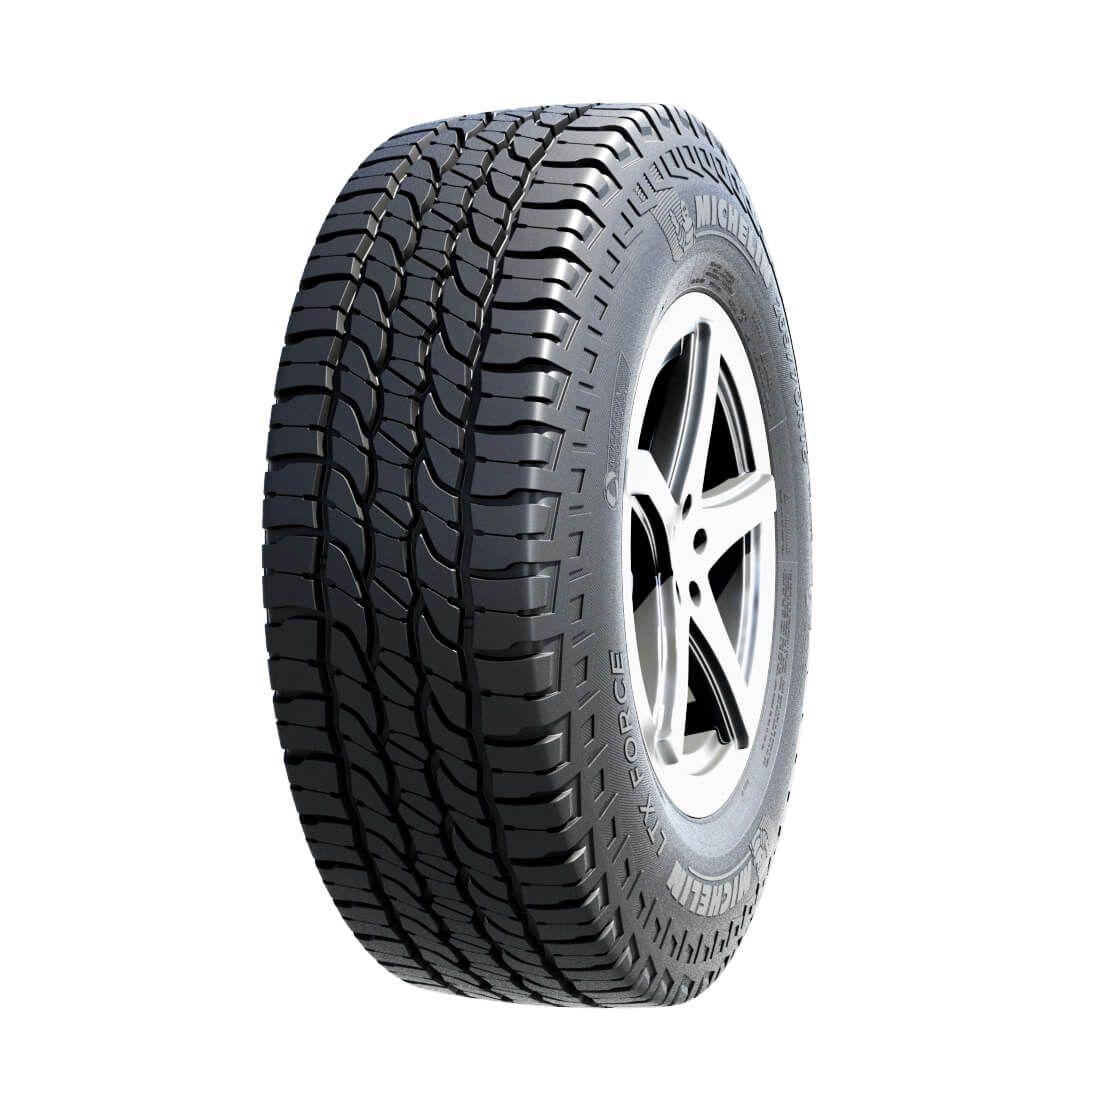 pneu michelin aro 16 ltx force 205 60r16 92h tl pneu para carro magazine luiza. Black Bedroom Furniture Sets. Home Design Ideas